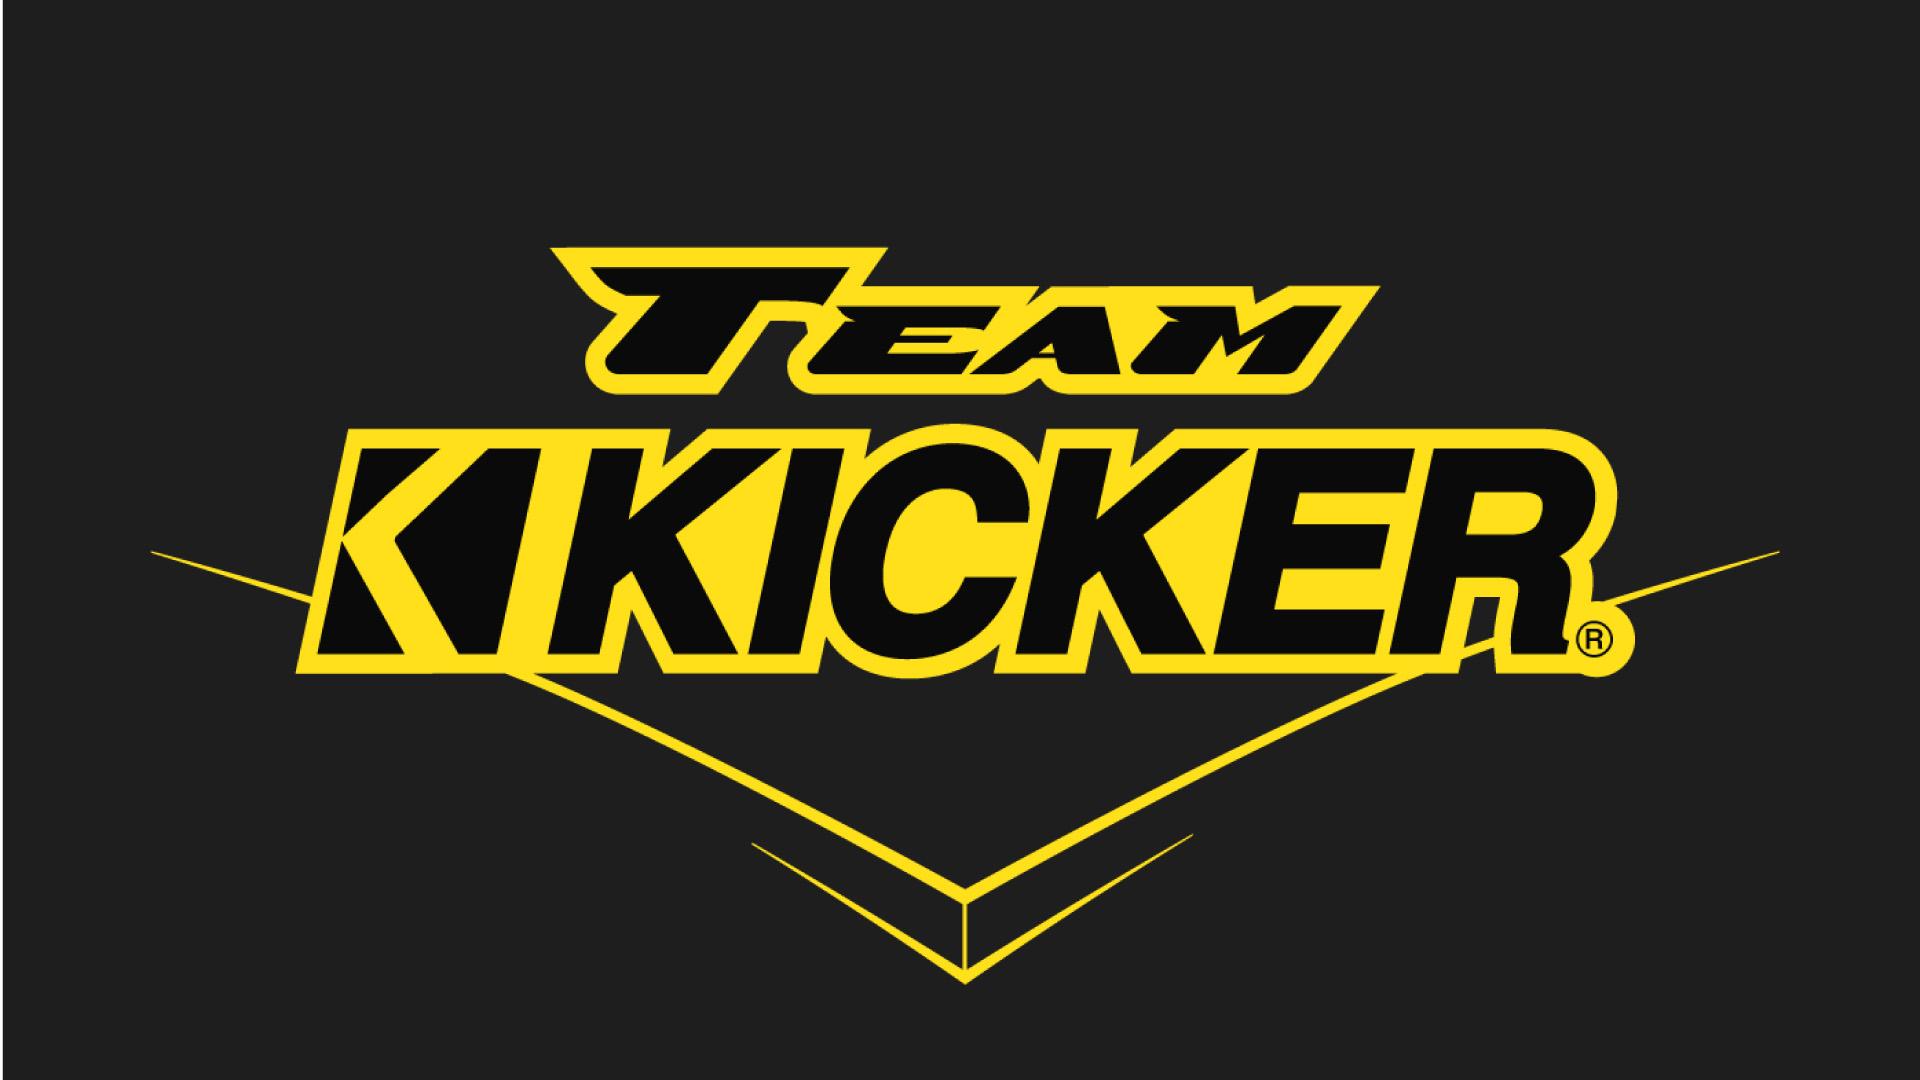 Card Artwork  C2 B7 Team Kicker